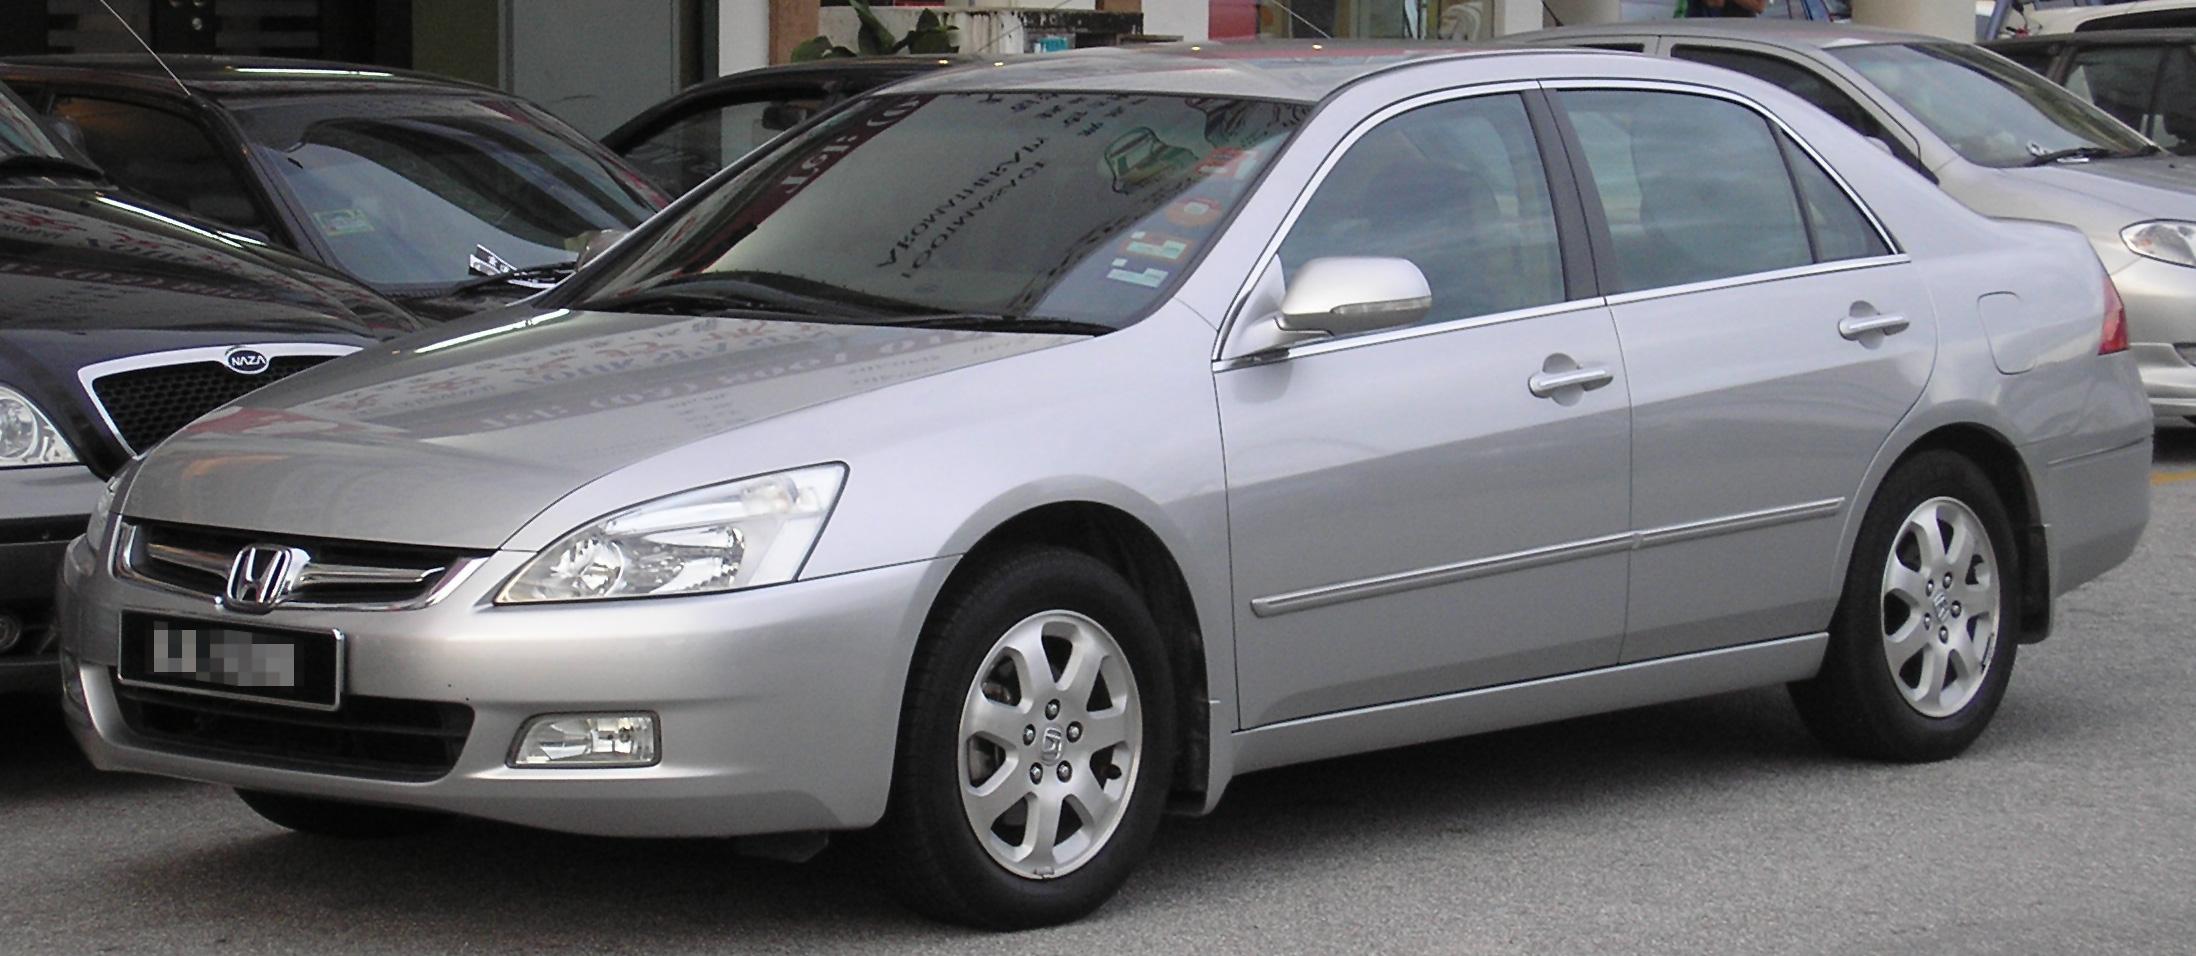 First Honda Accord